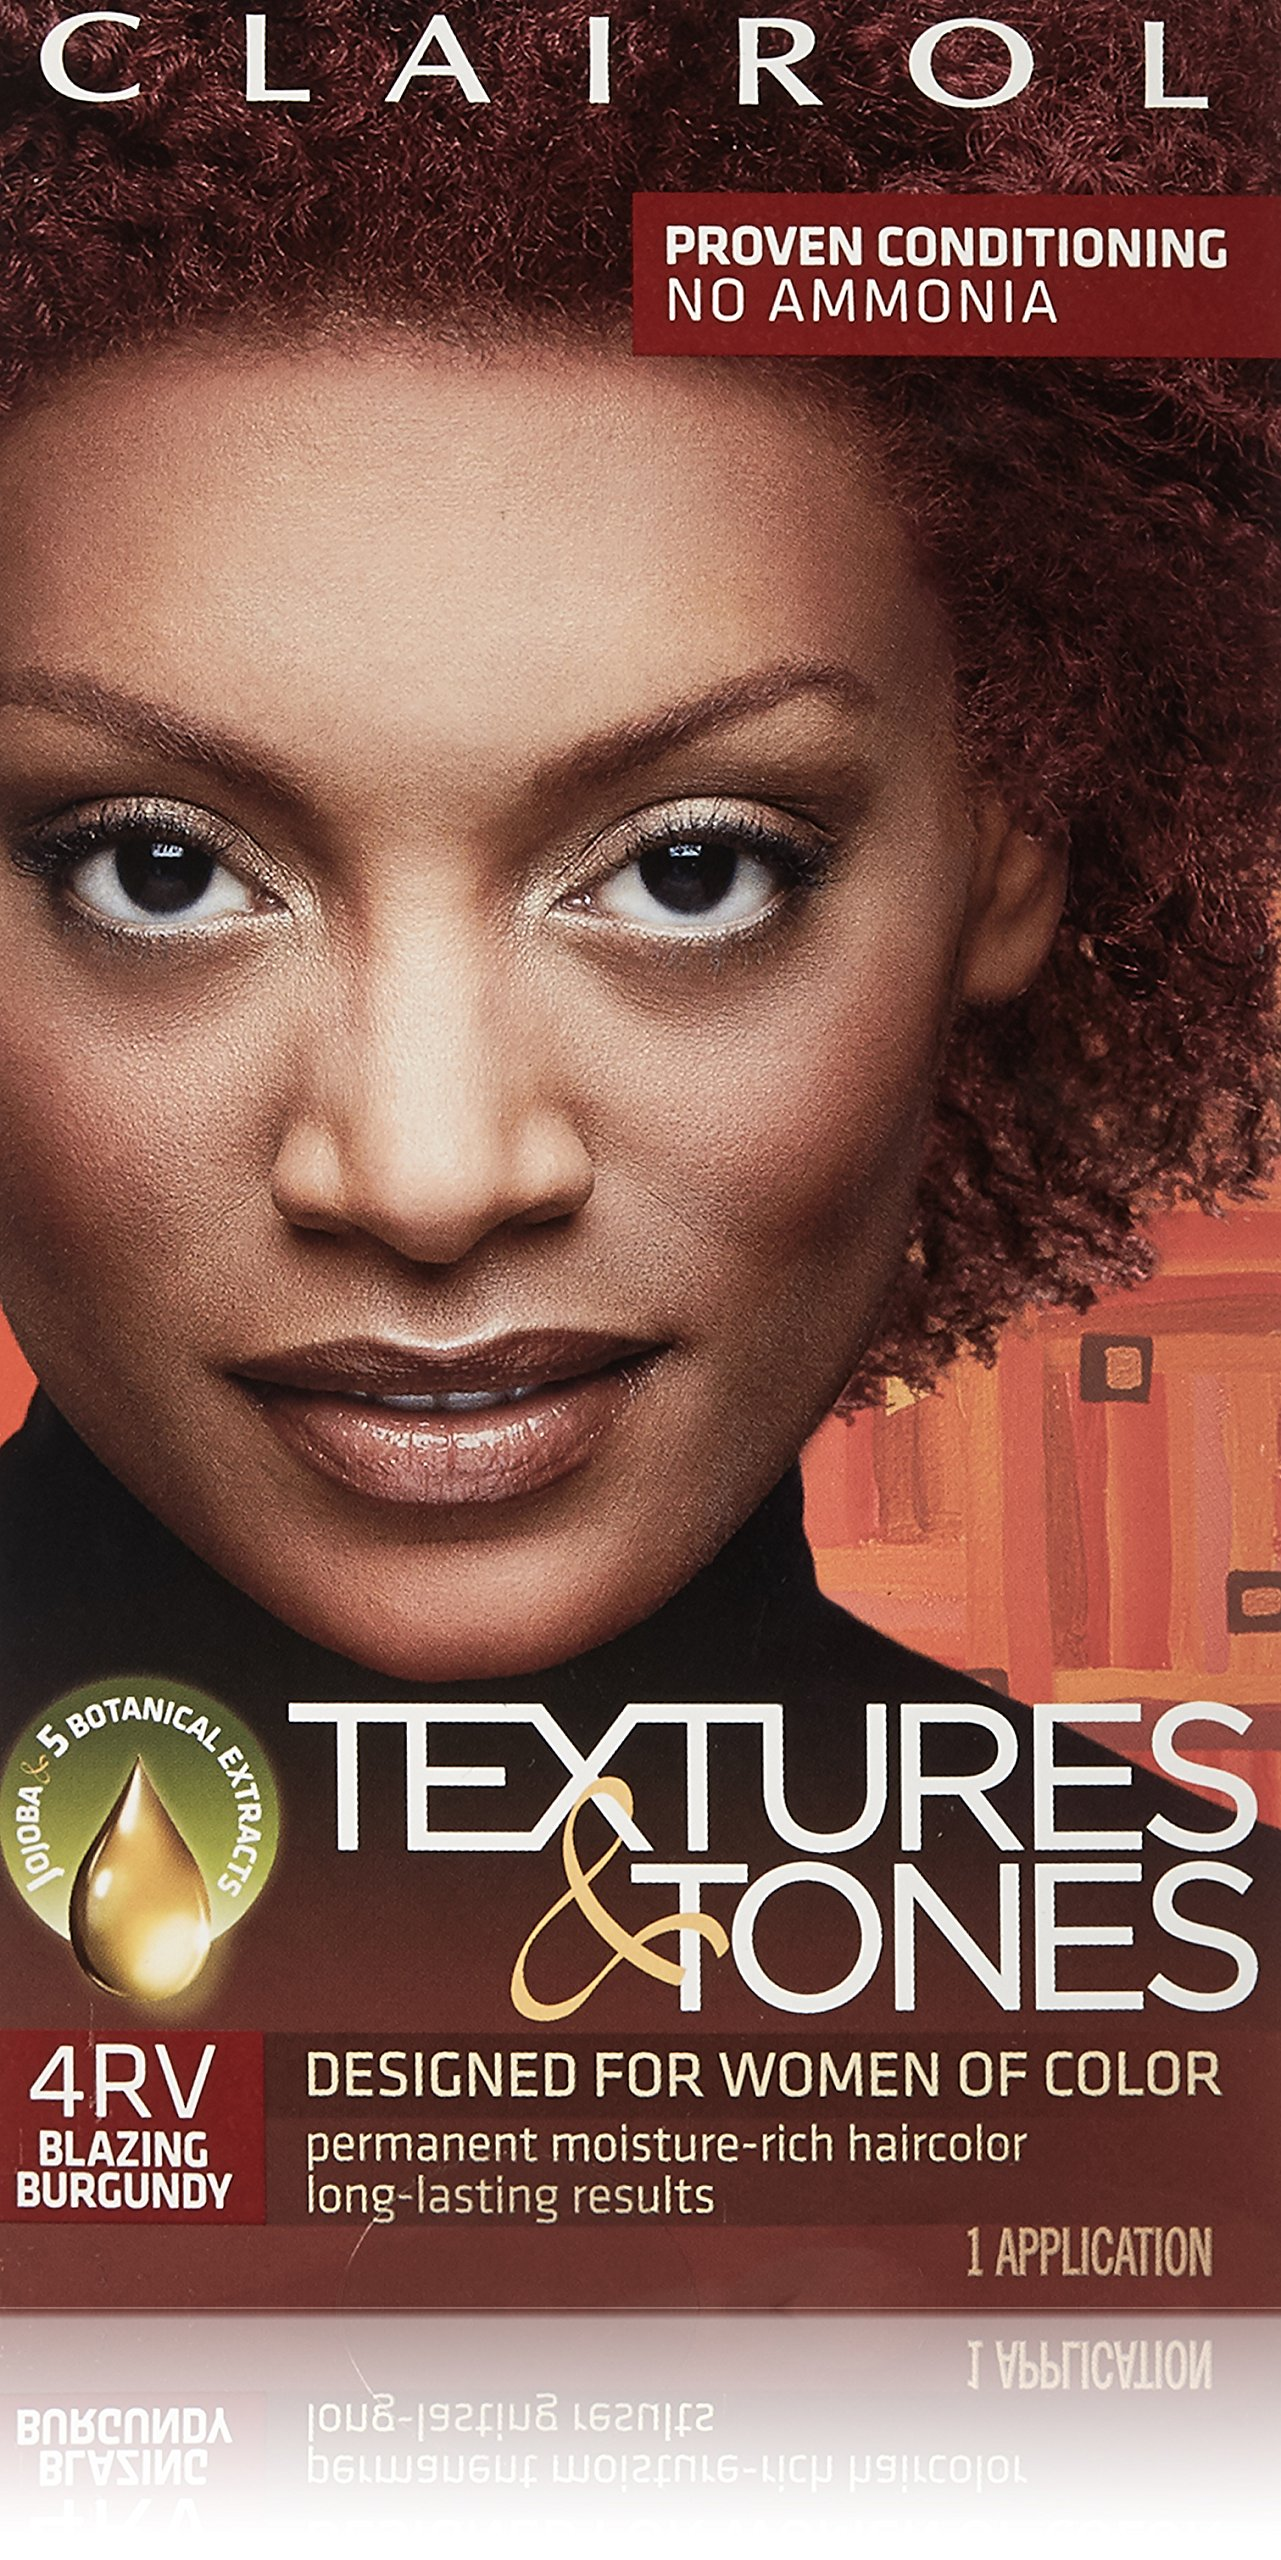 Amazon Clairol Textures And Tones Hair Dye Blazing Burgundy